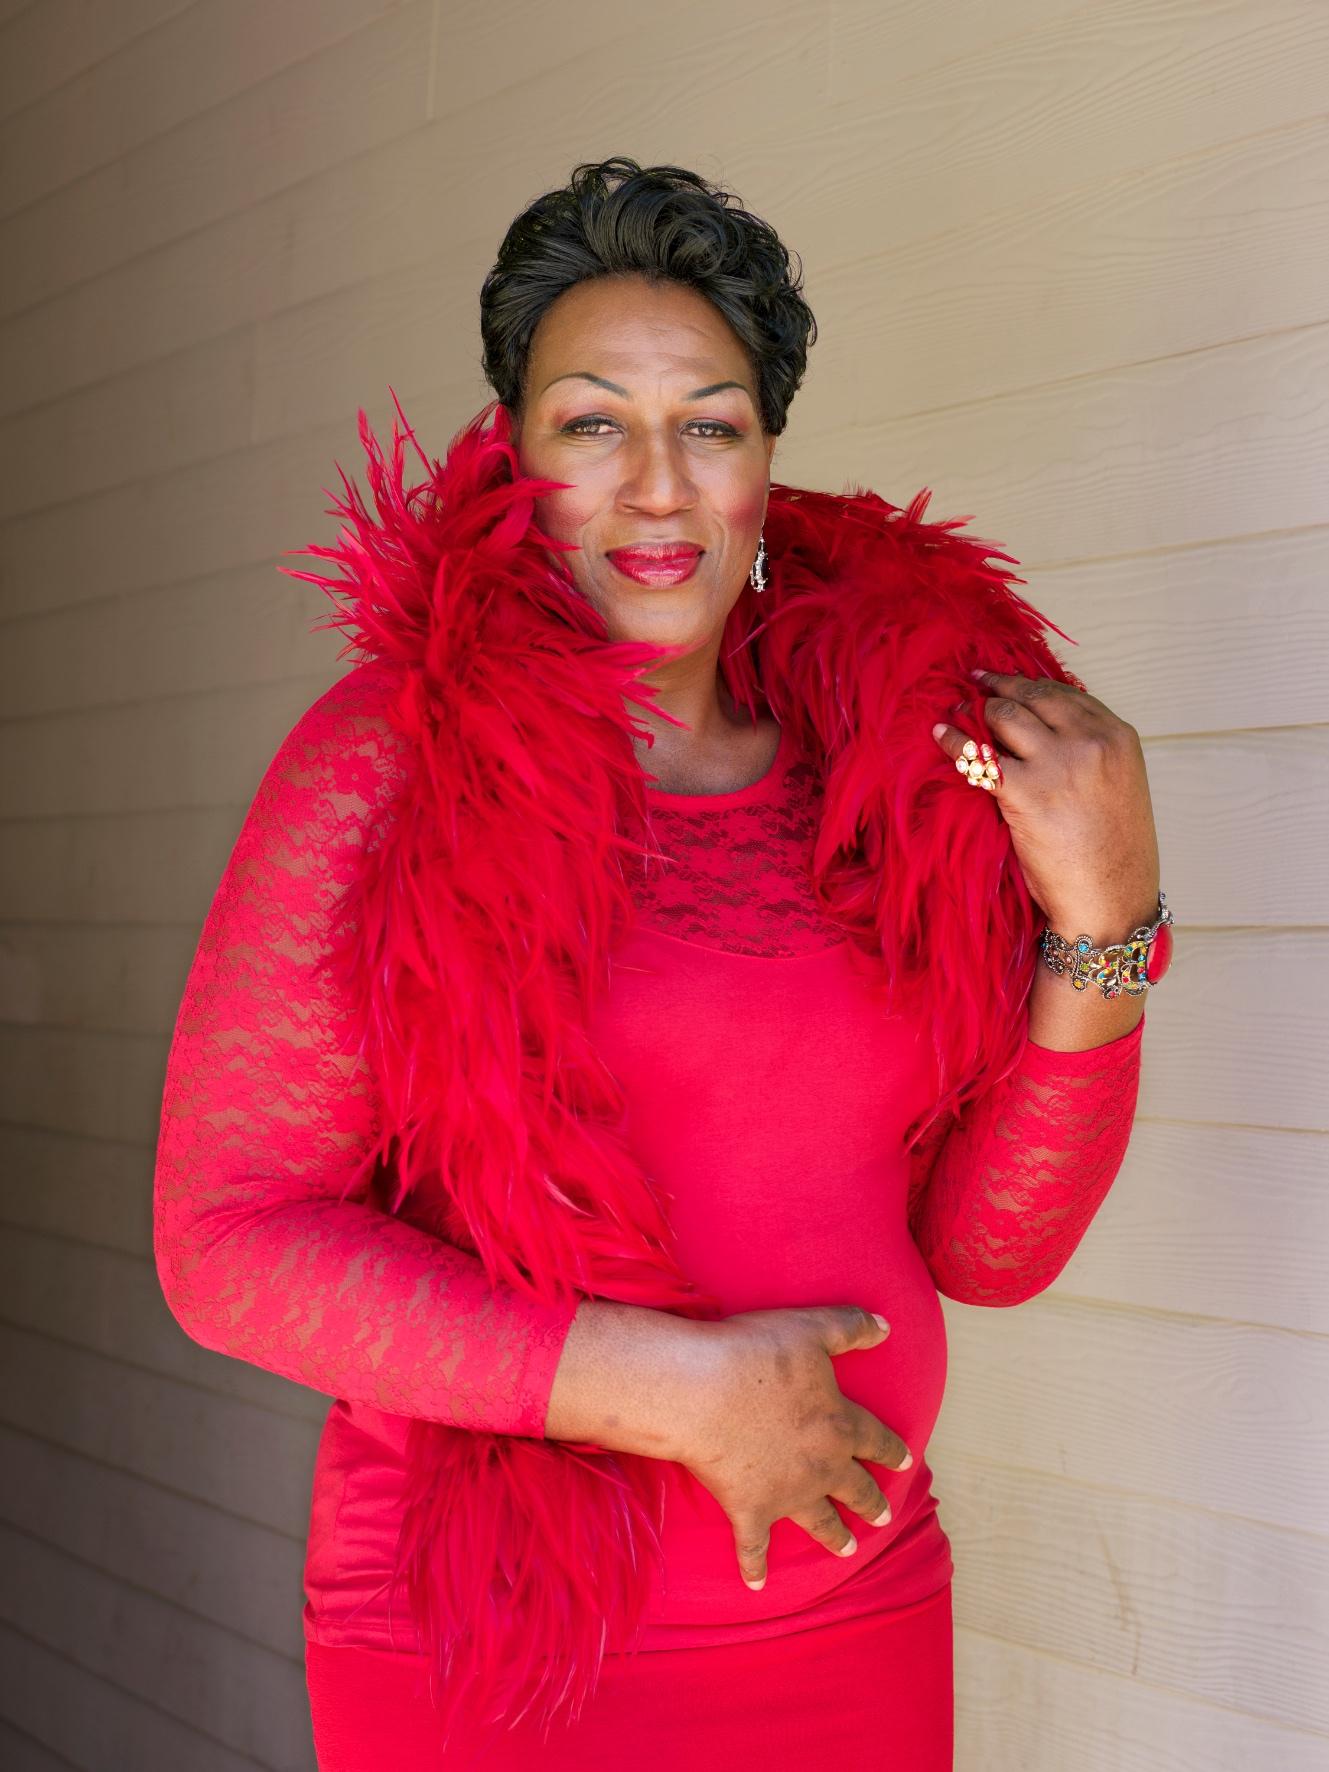 1_Dee Dee Ngozi, 55, Atlanta, GA, 2016 © Jess T. Dugan